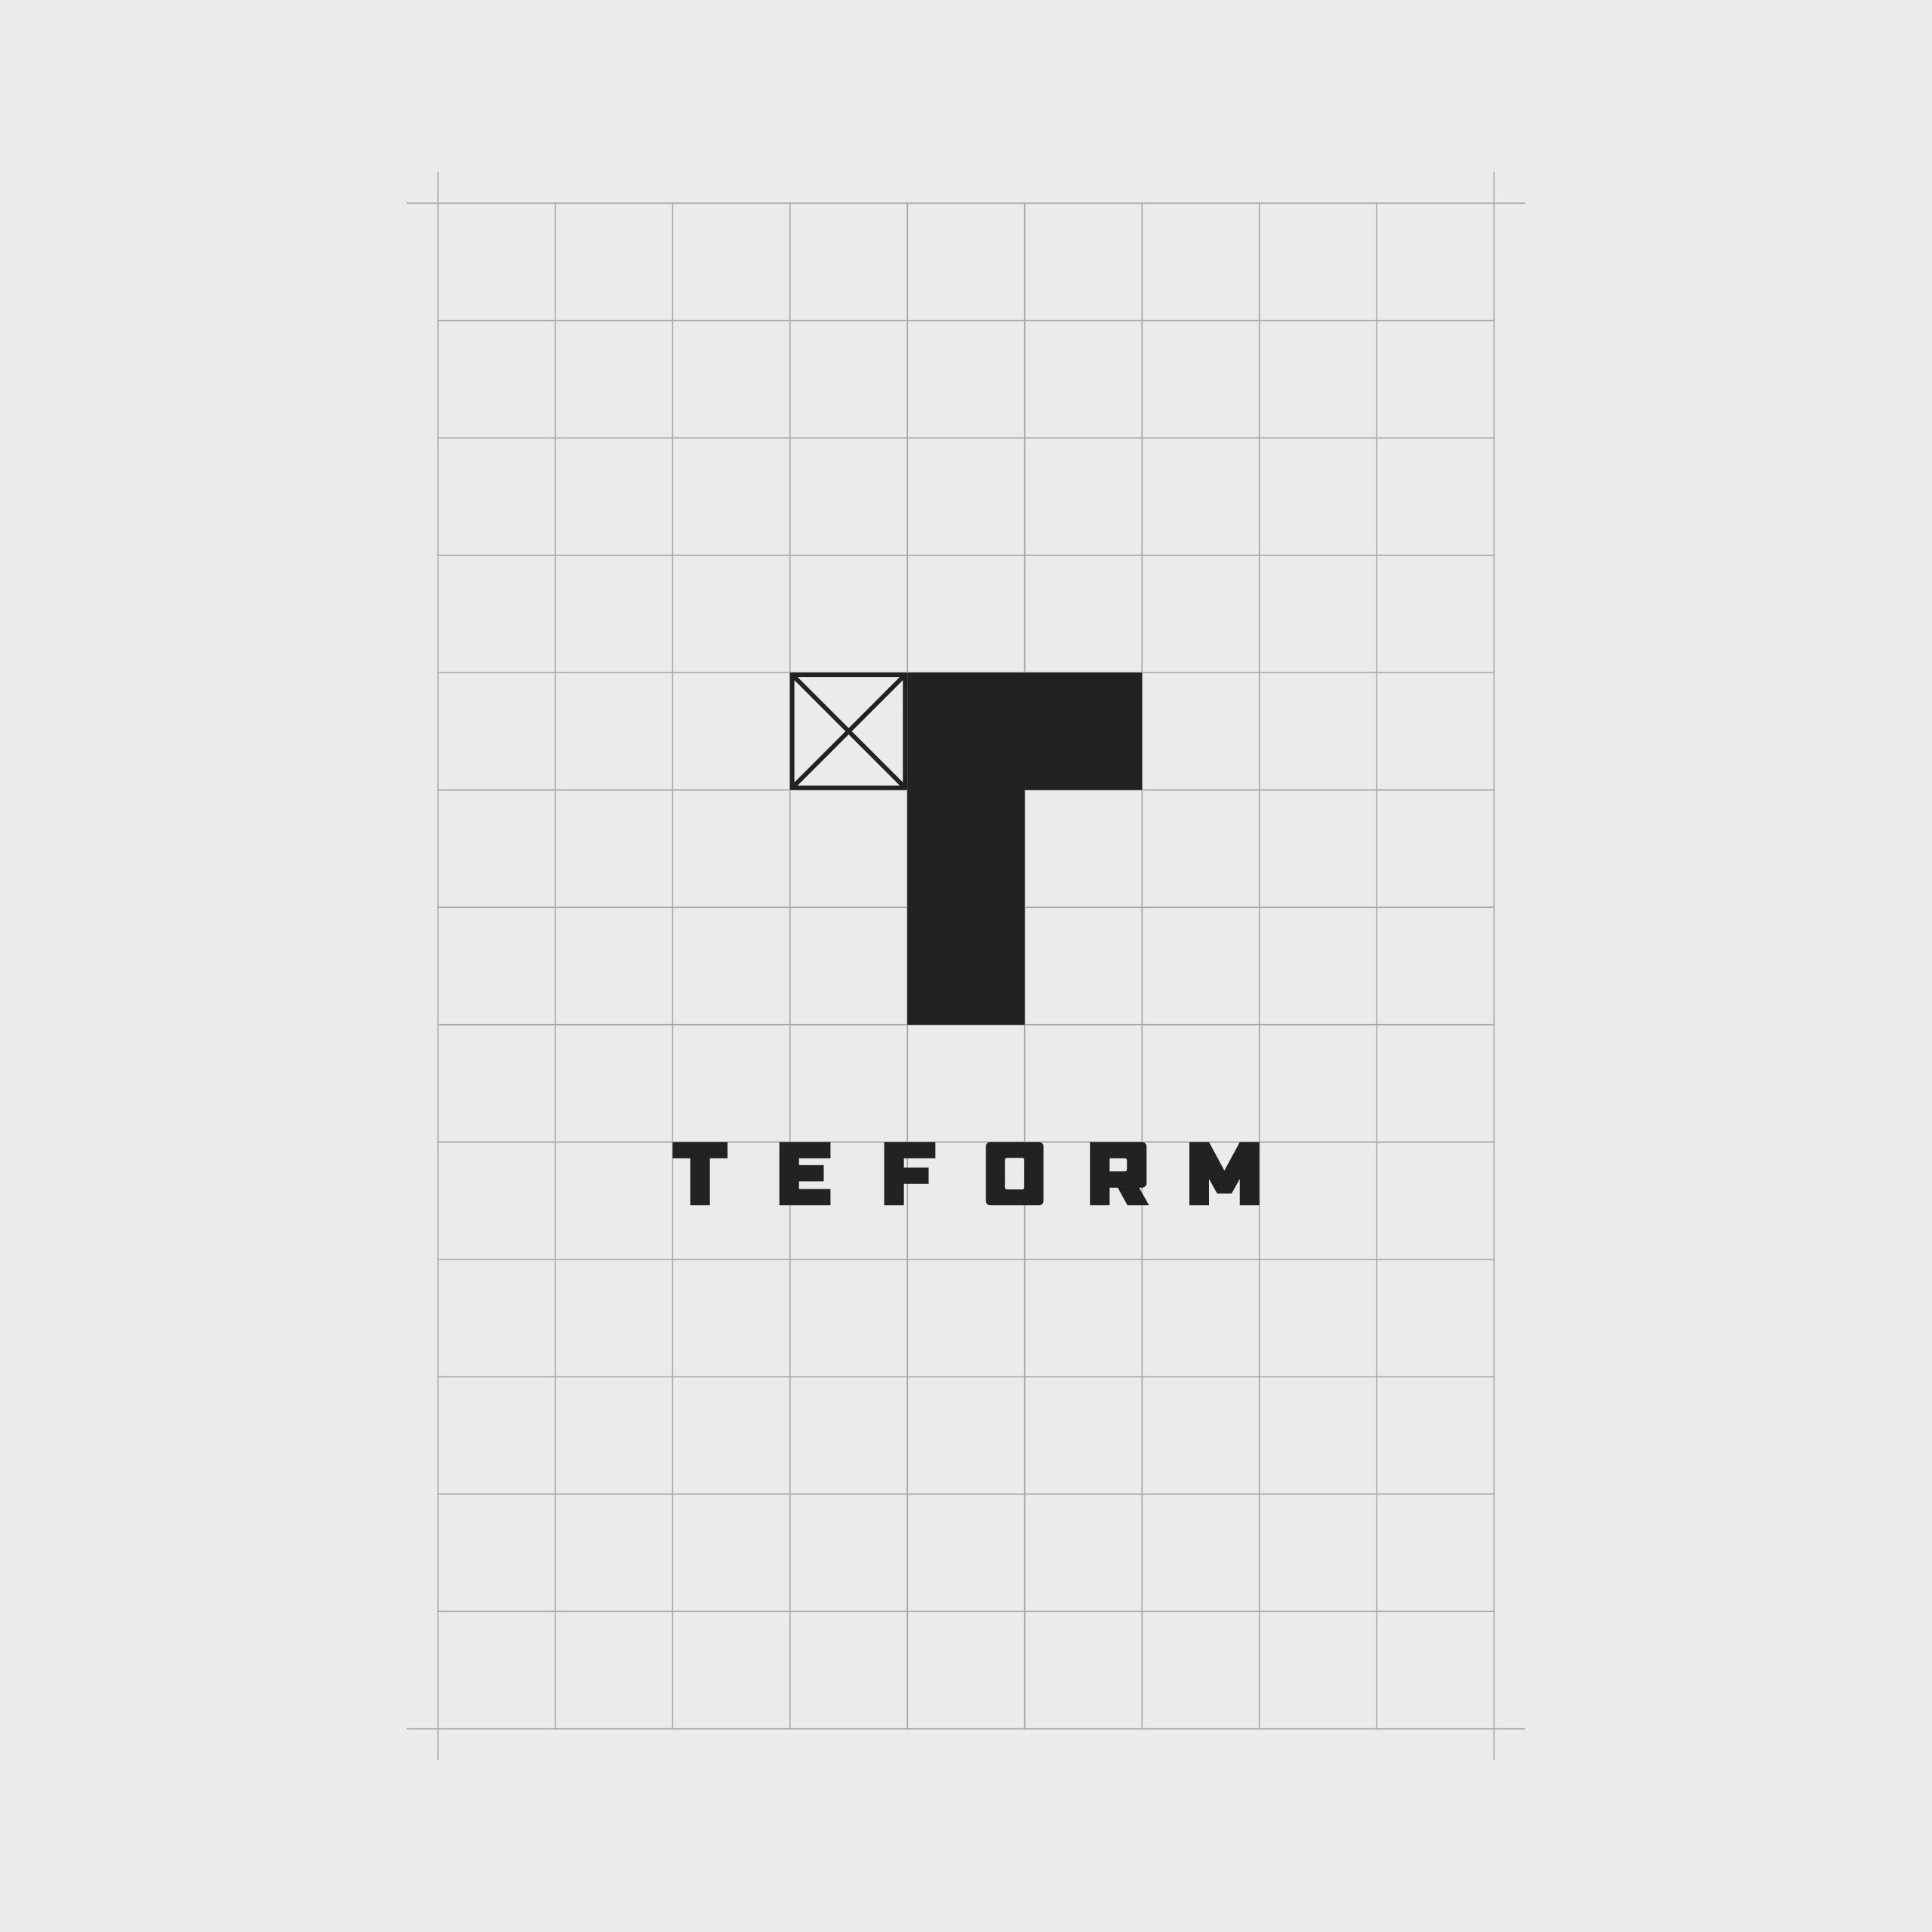 teform-vertical-1